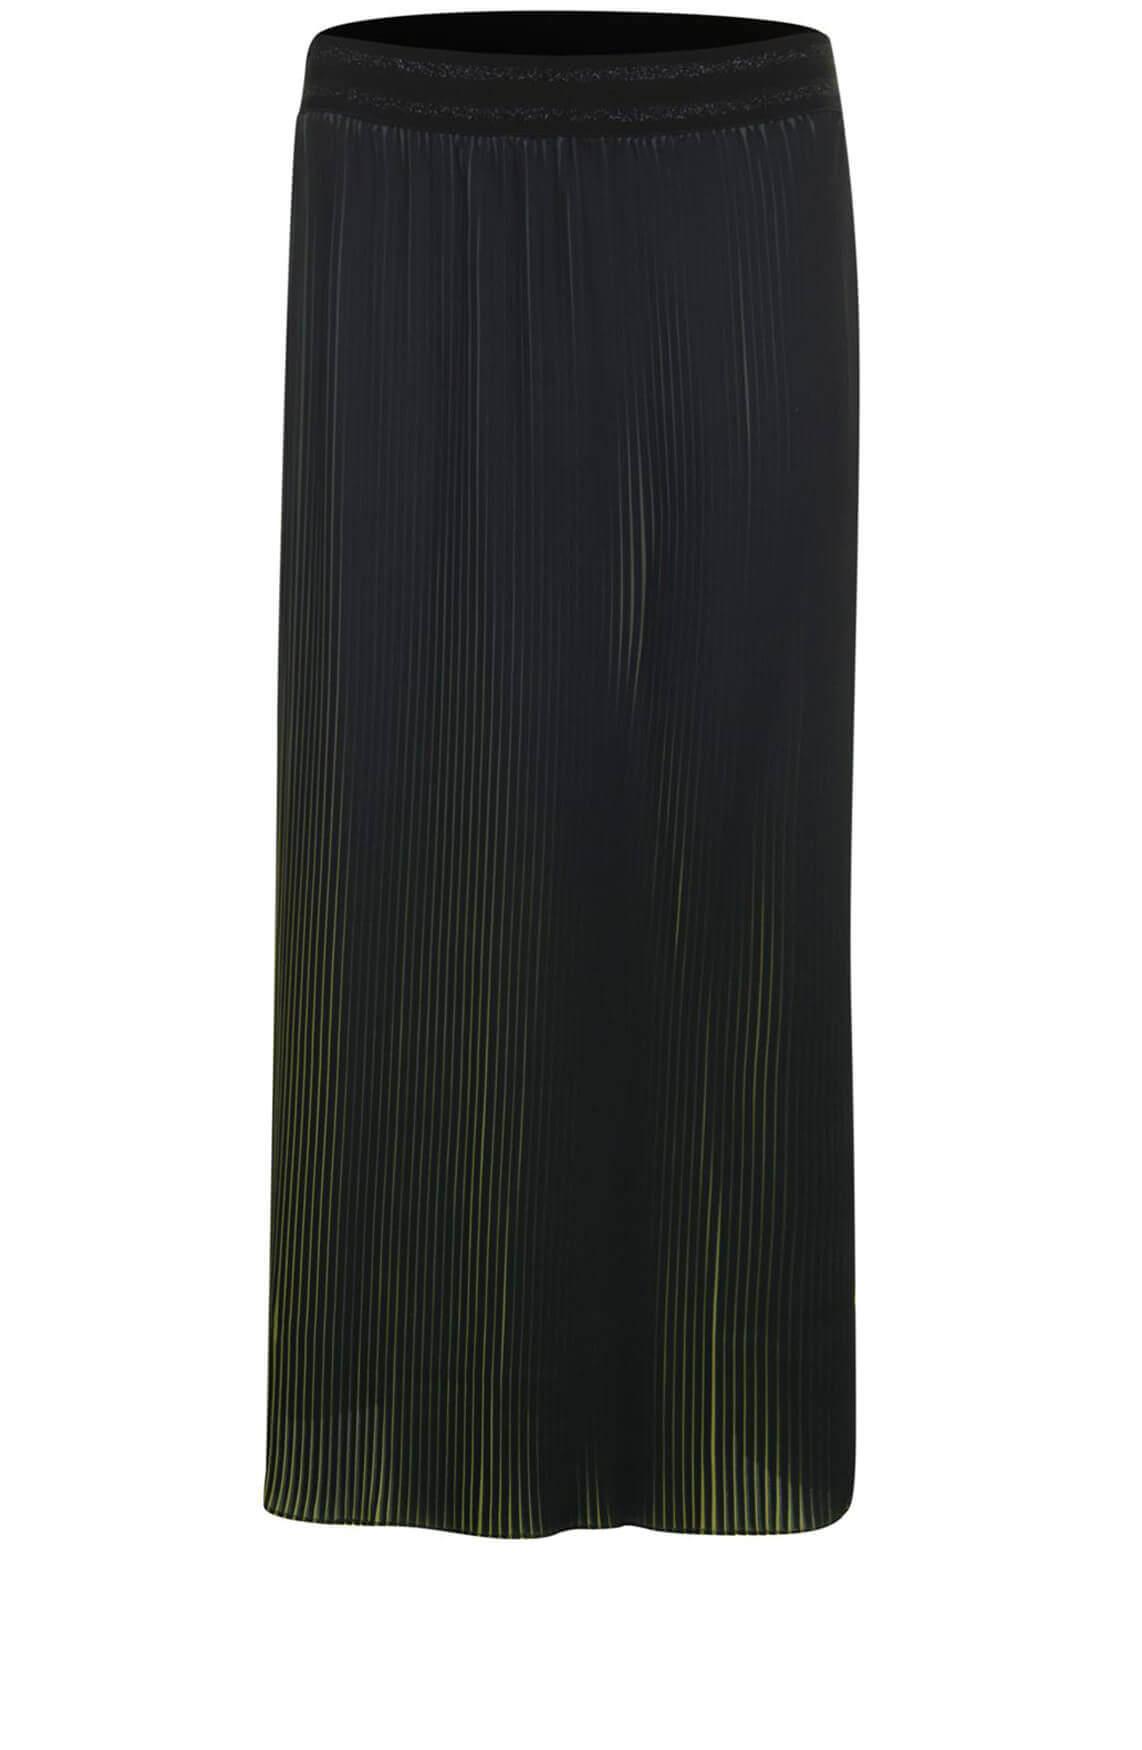 Poools Dames Ombré plissé rok groen